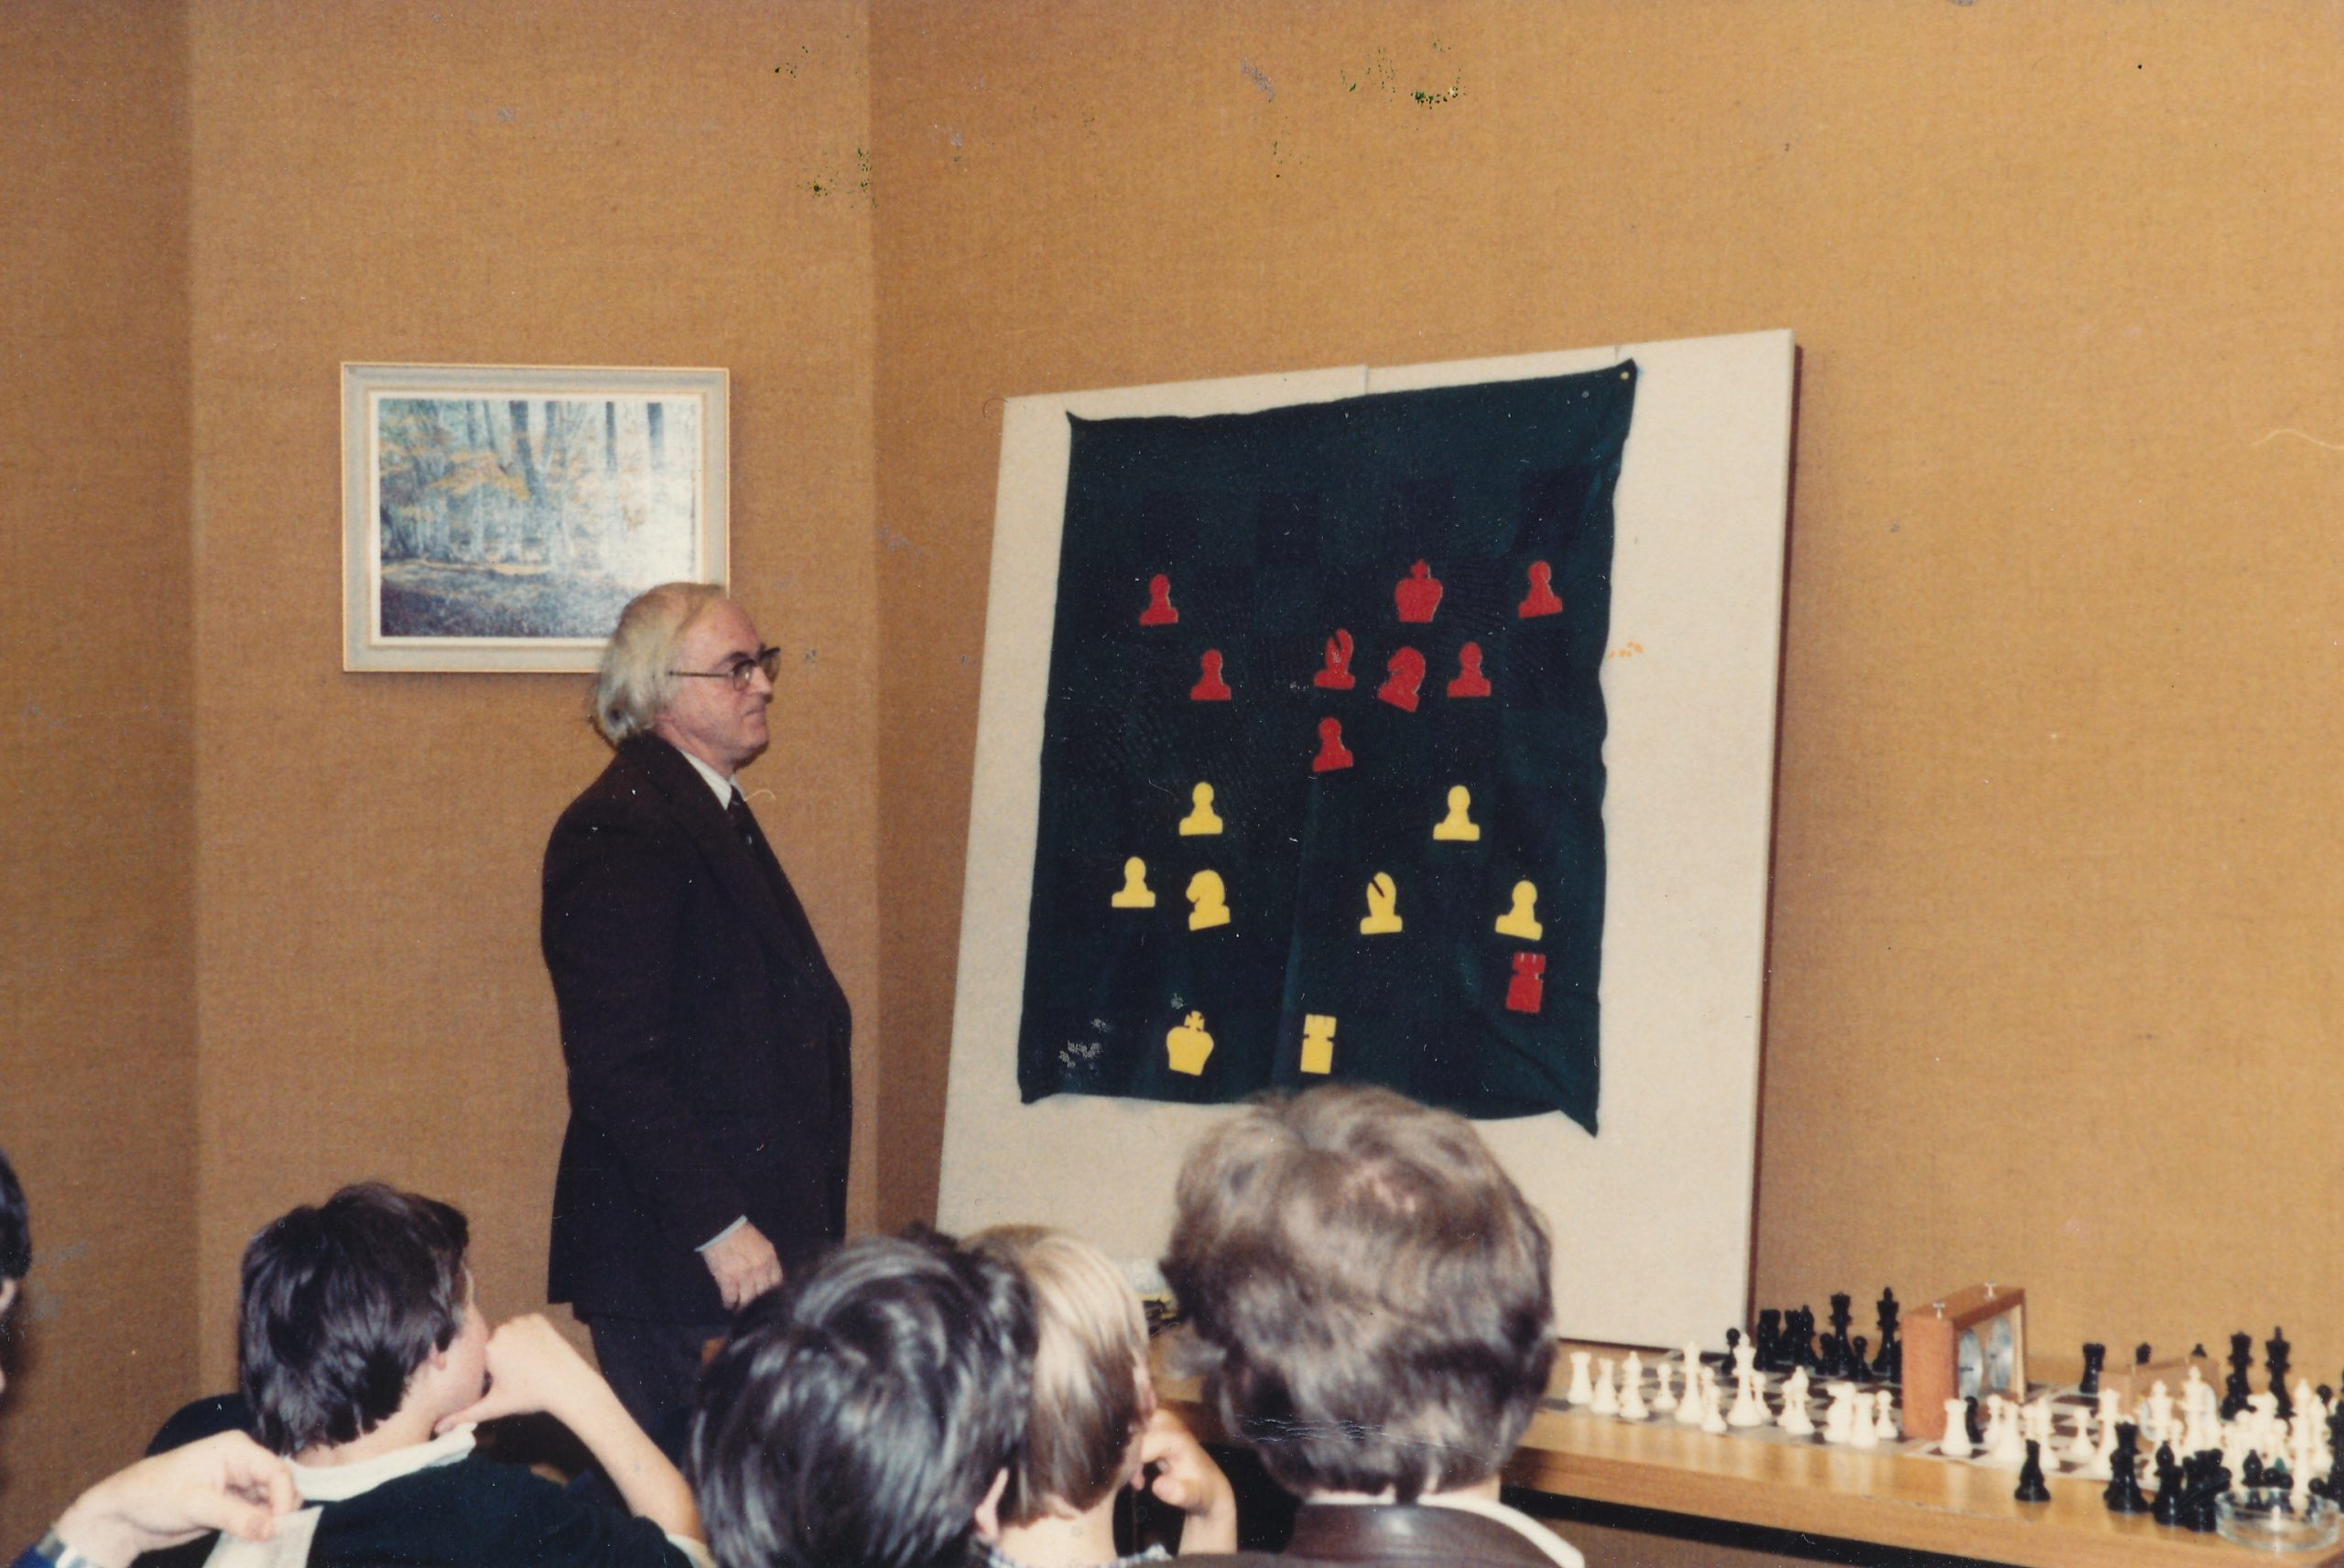 Bob at the demo board at London Central YMCA chess club.